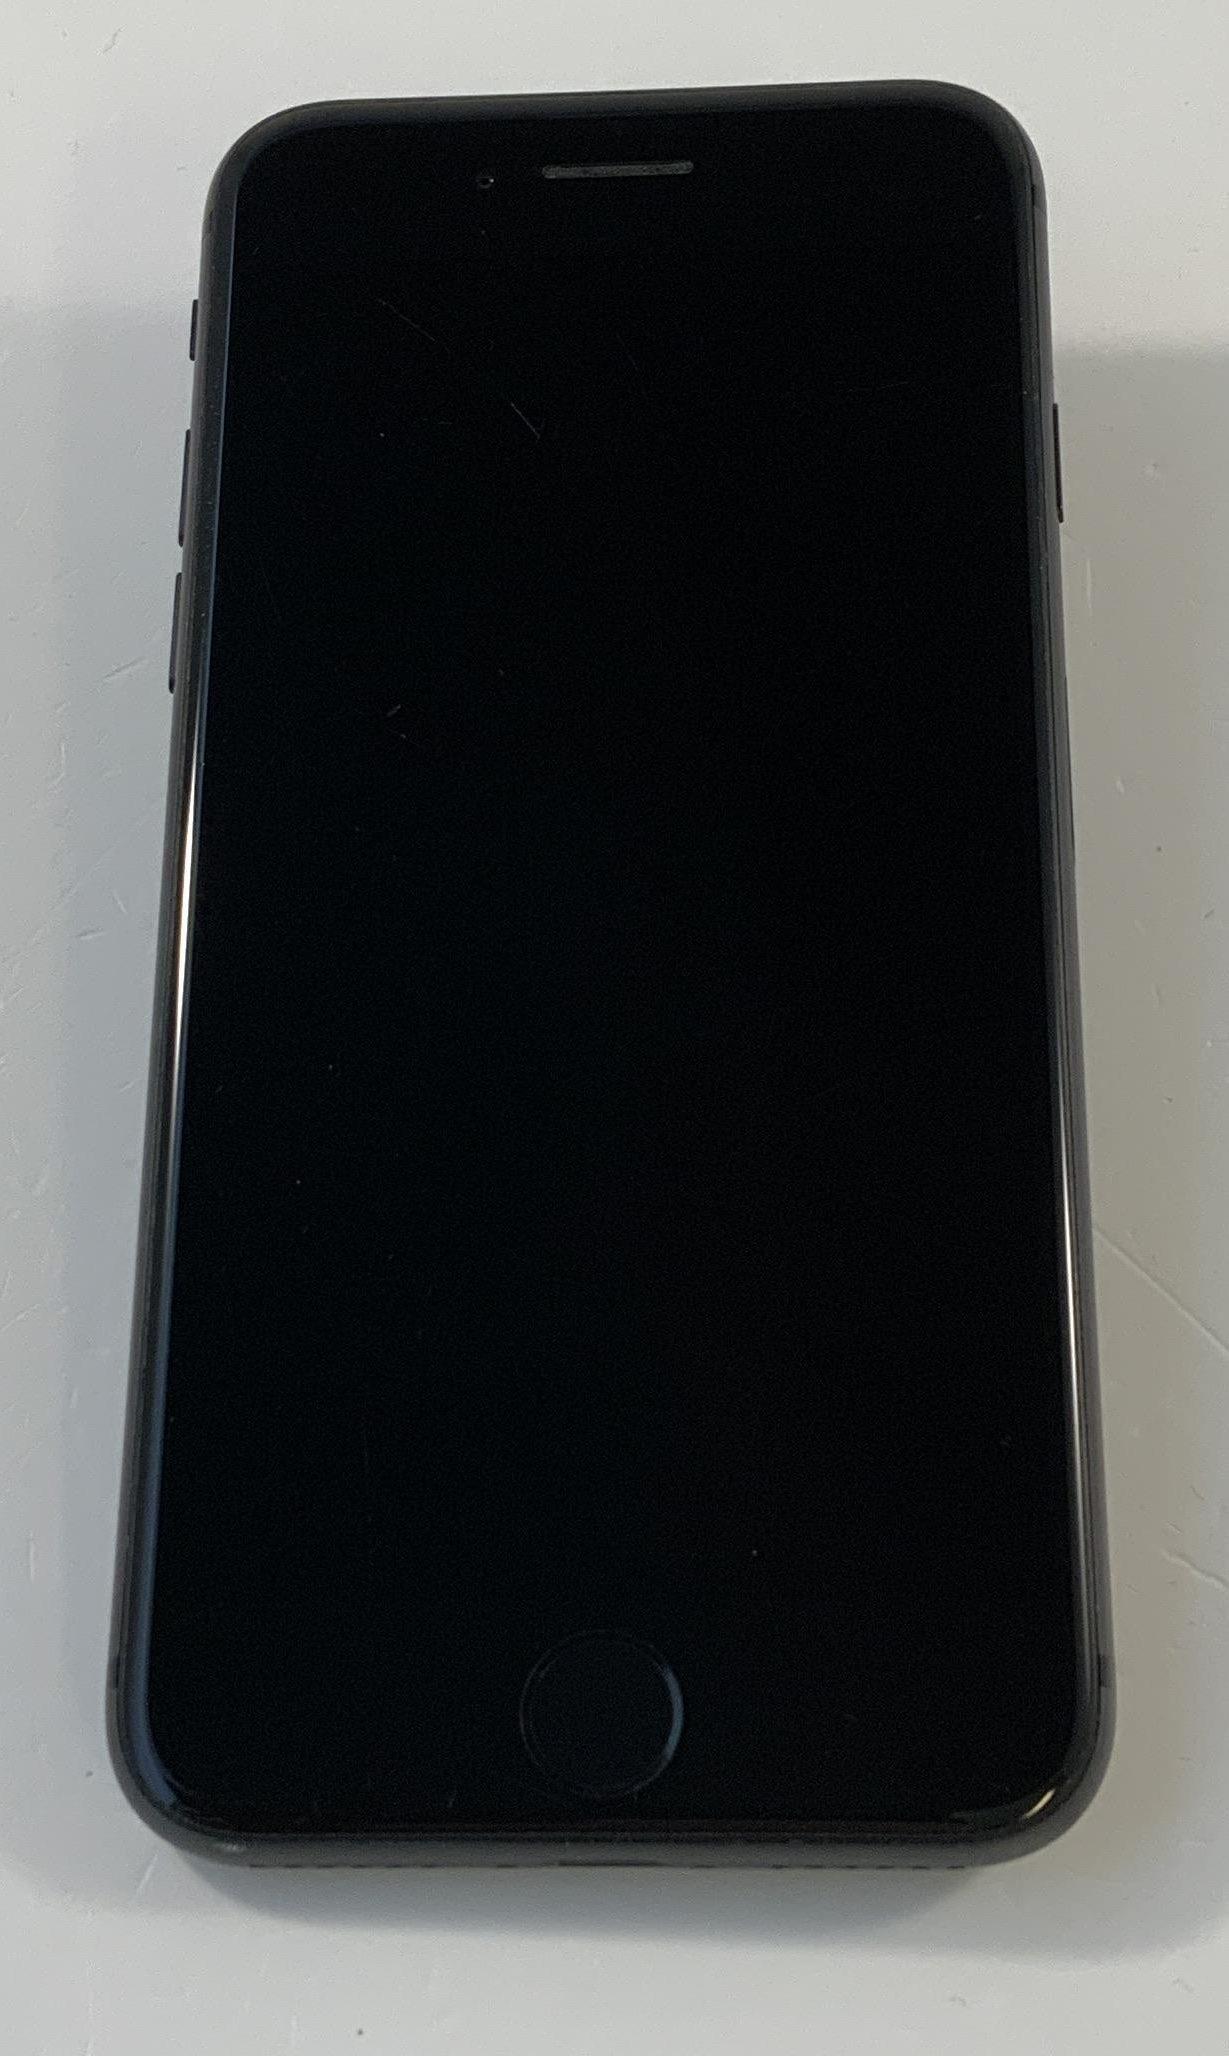 iPhone 8 64GB, 64GB, Space Gray, immagine 1